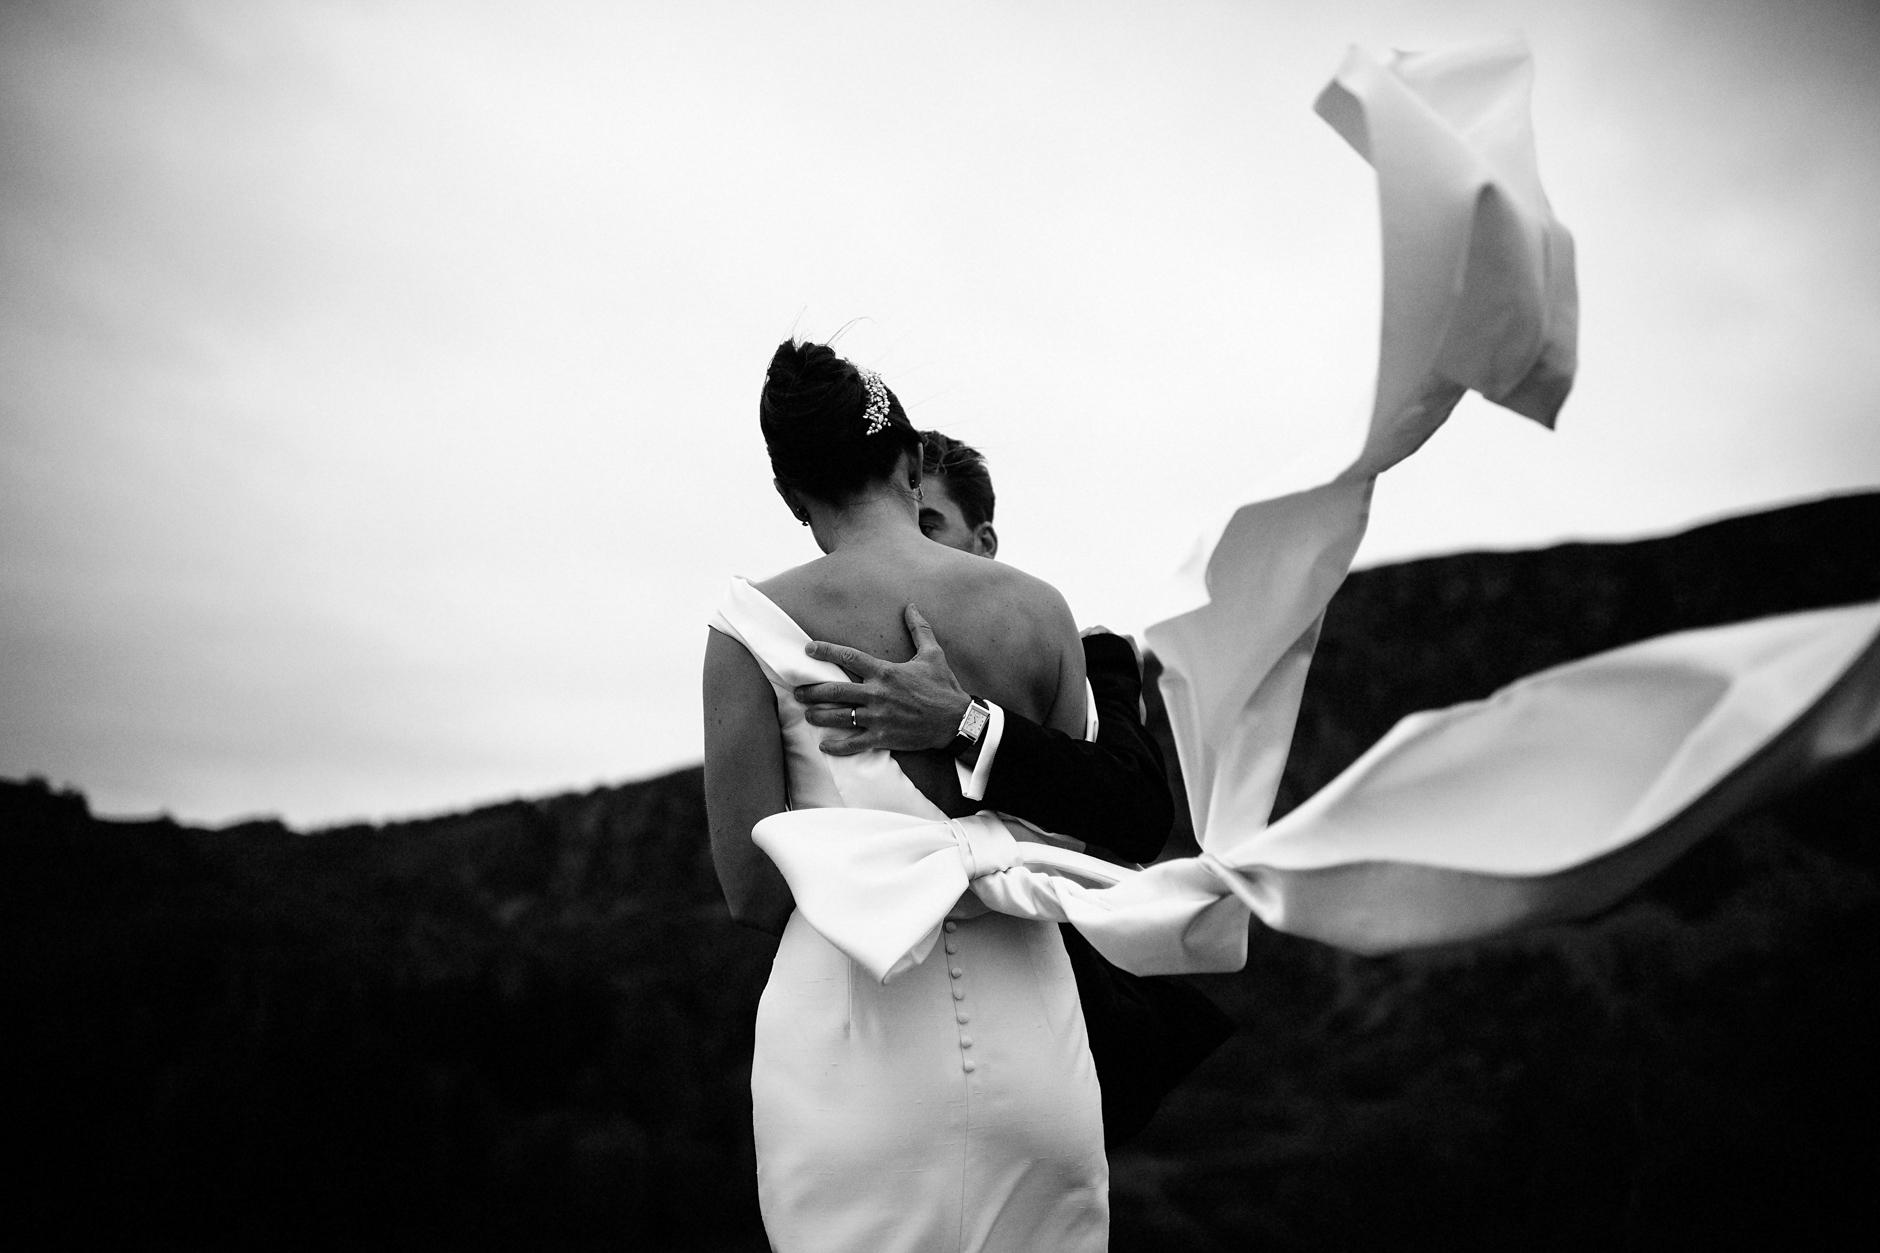 Glentruim-Wedding-Nikki-Leadbetter-Photography-140.jpg